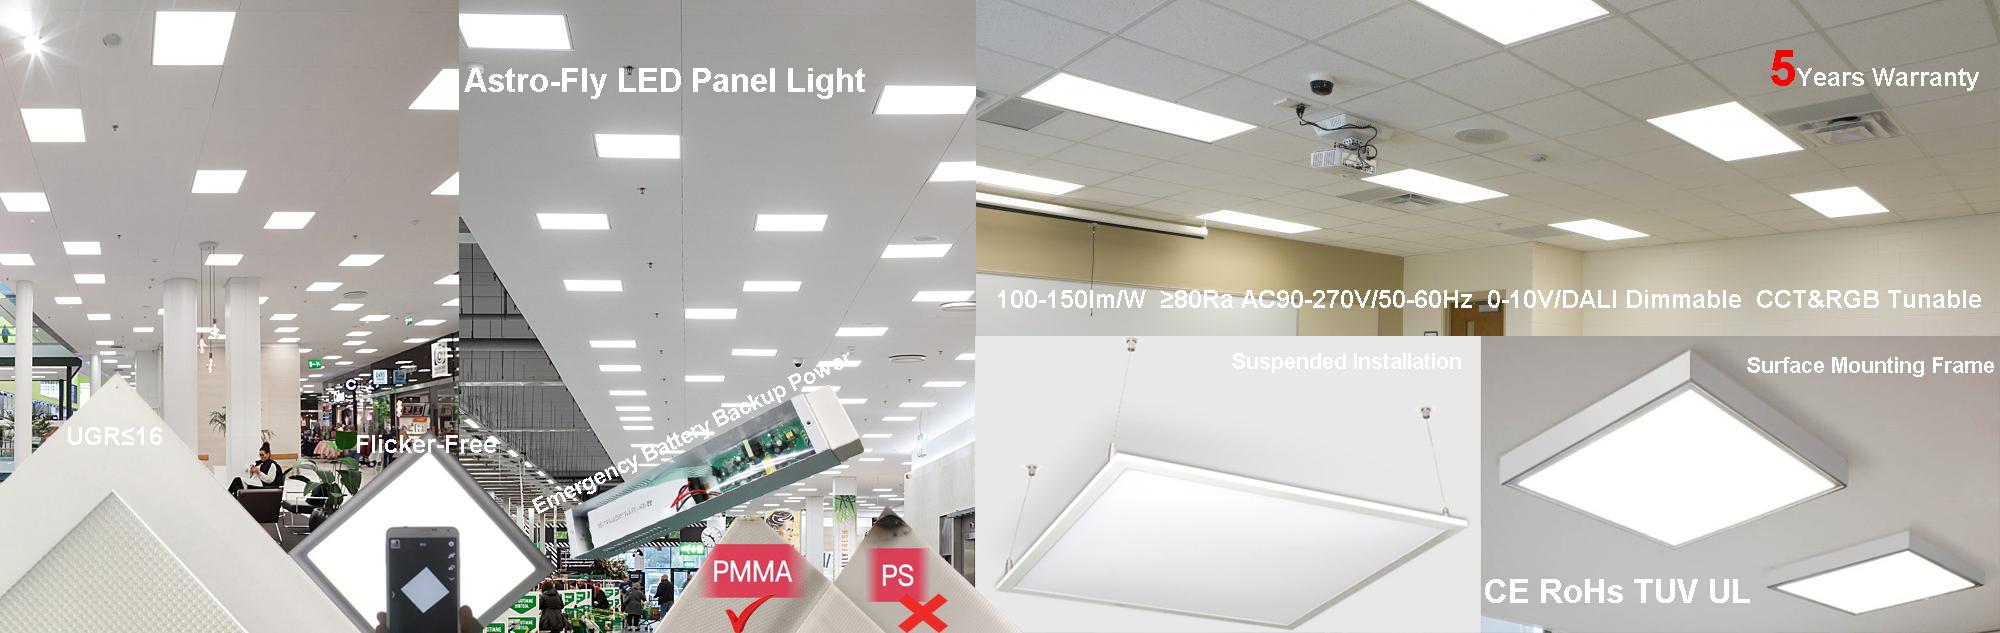 Astro-Fly LED Panel Light